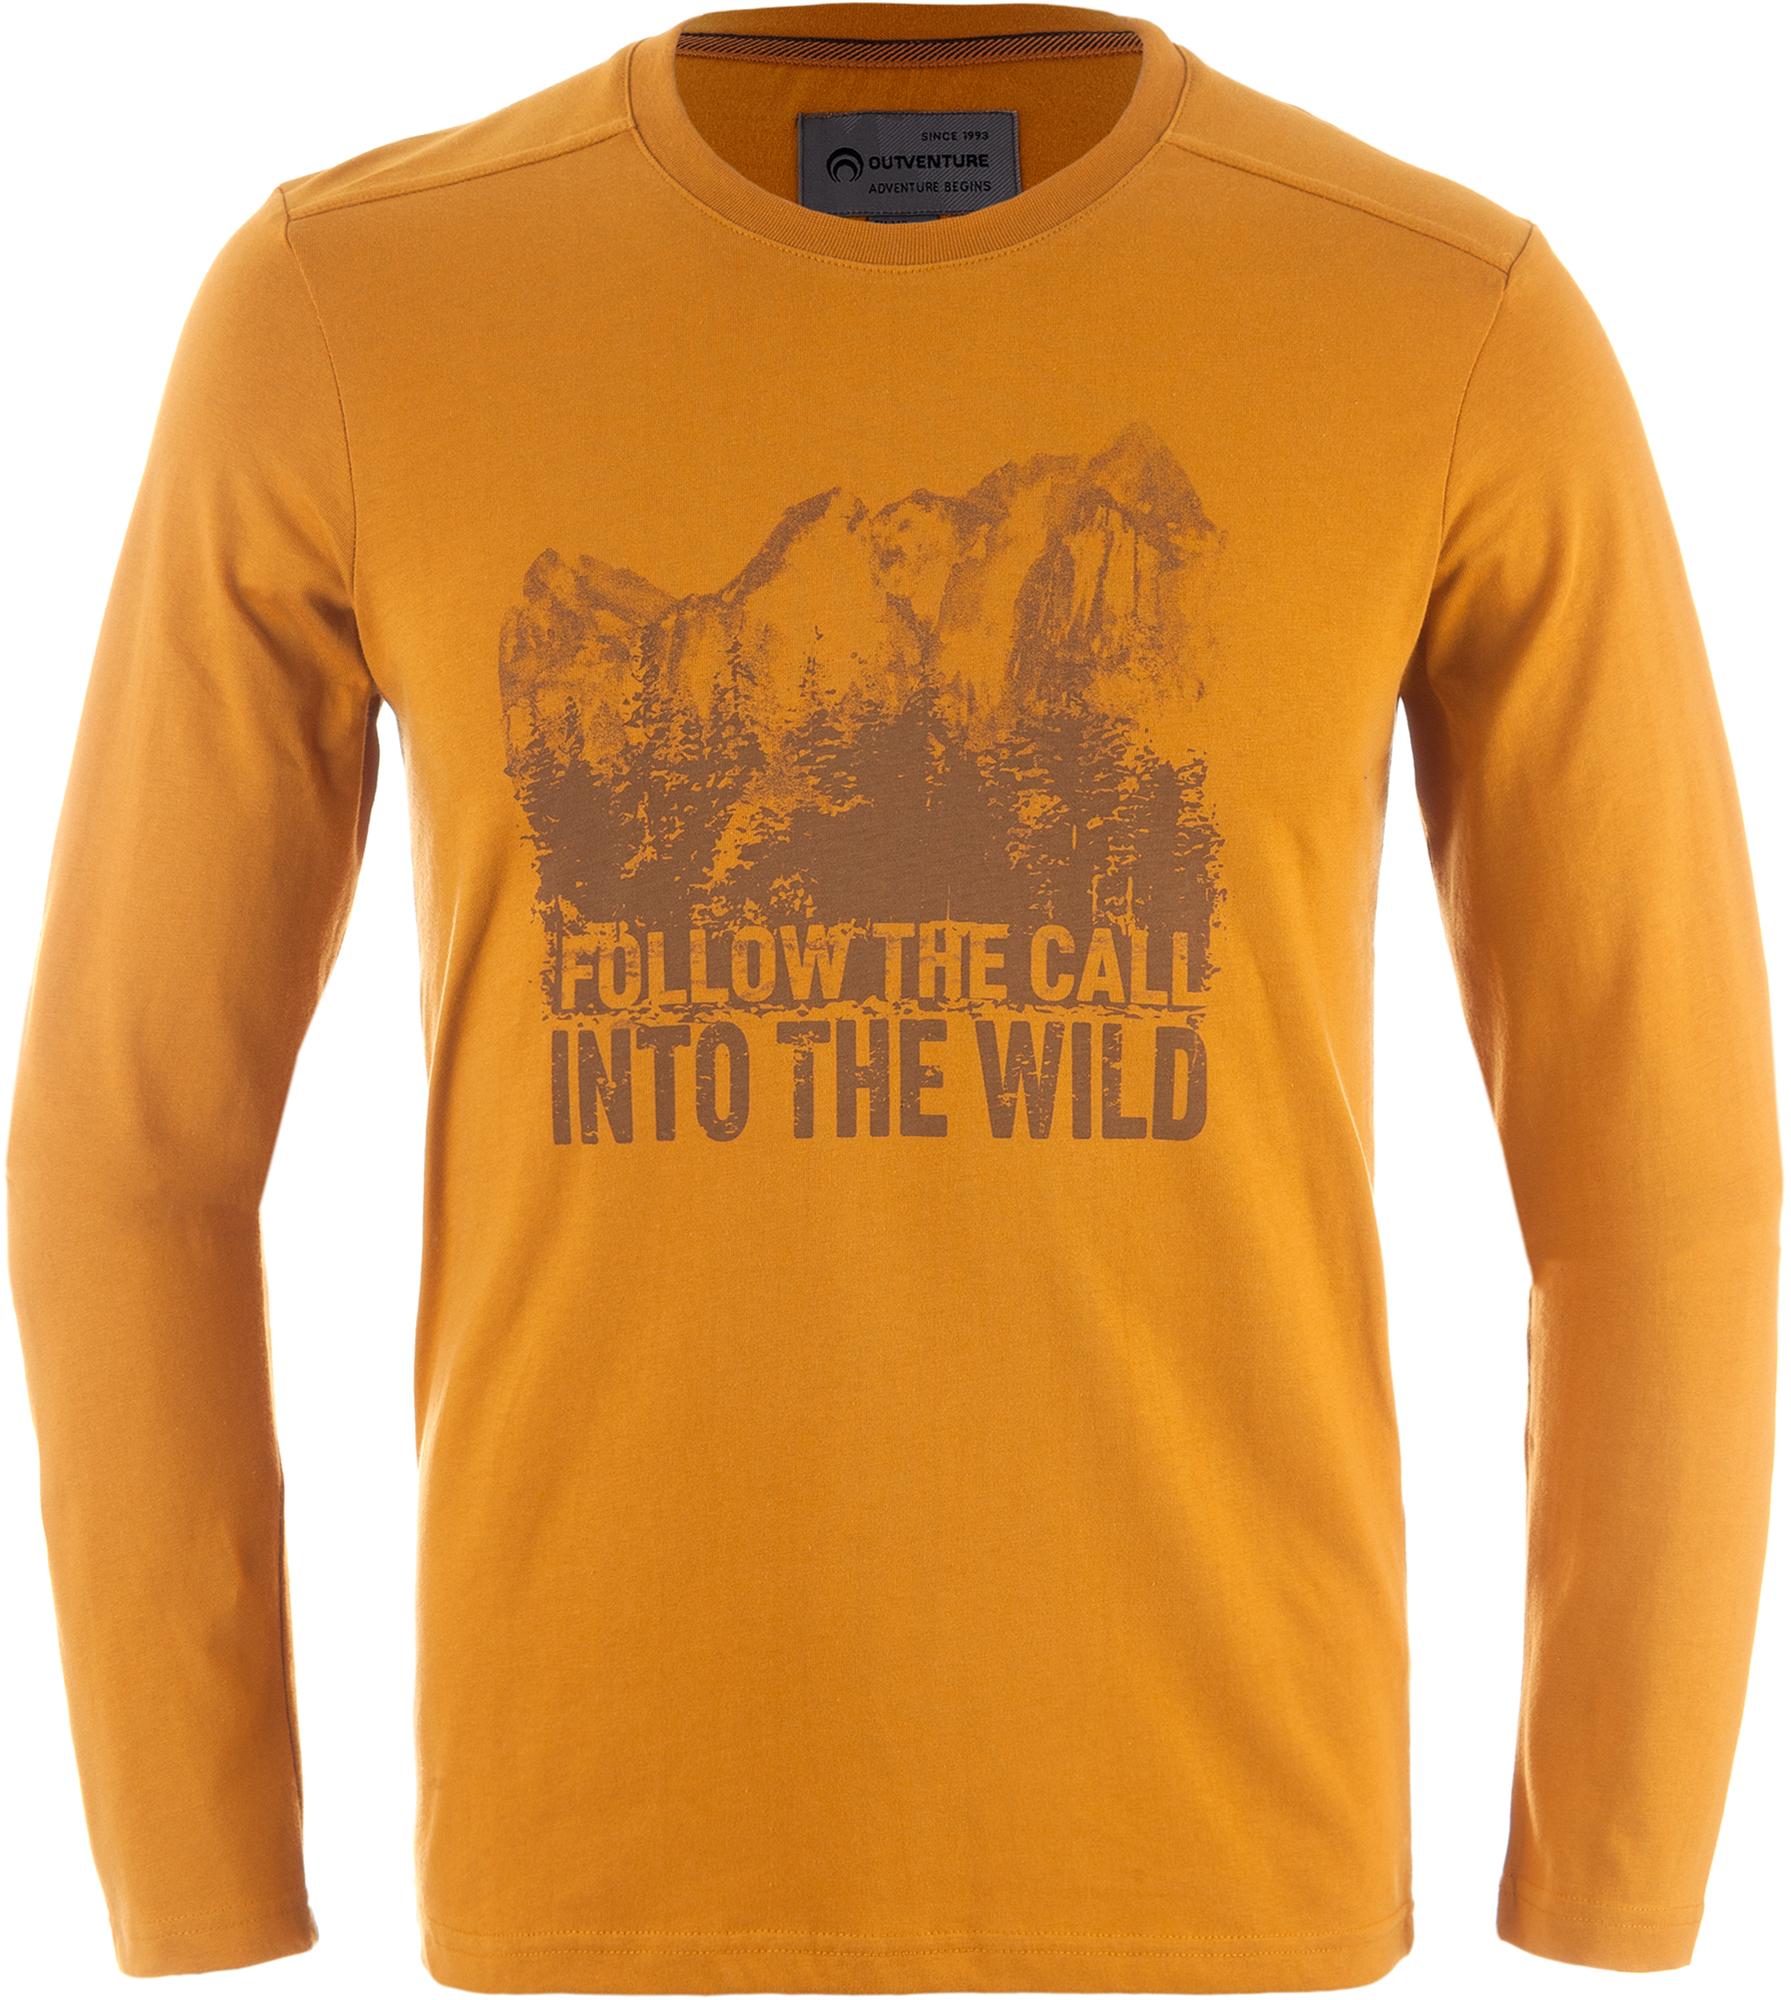 Outventure Футболка с длинным рукавом мужская Outventure футболка с длинным рукавом каникулы мари